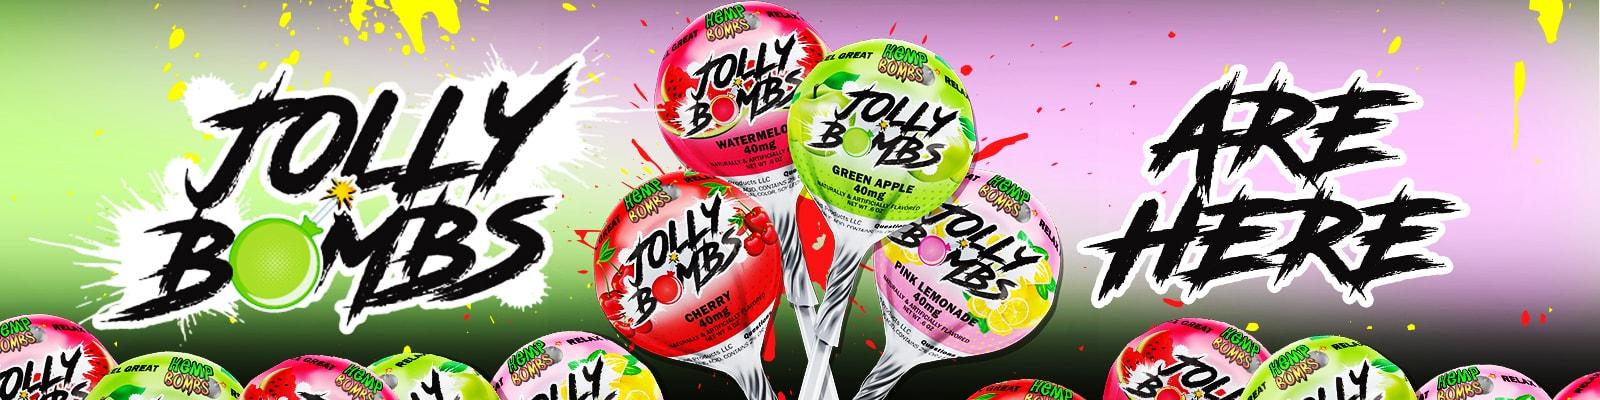 hemp bombs jolly bombs - cbd lollipops